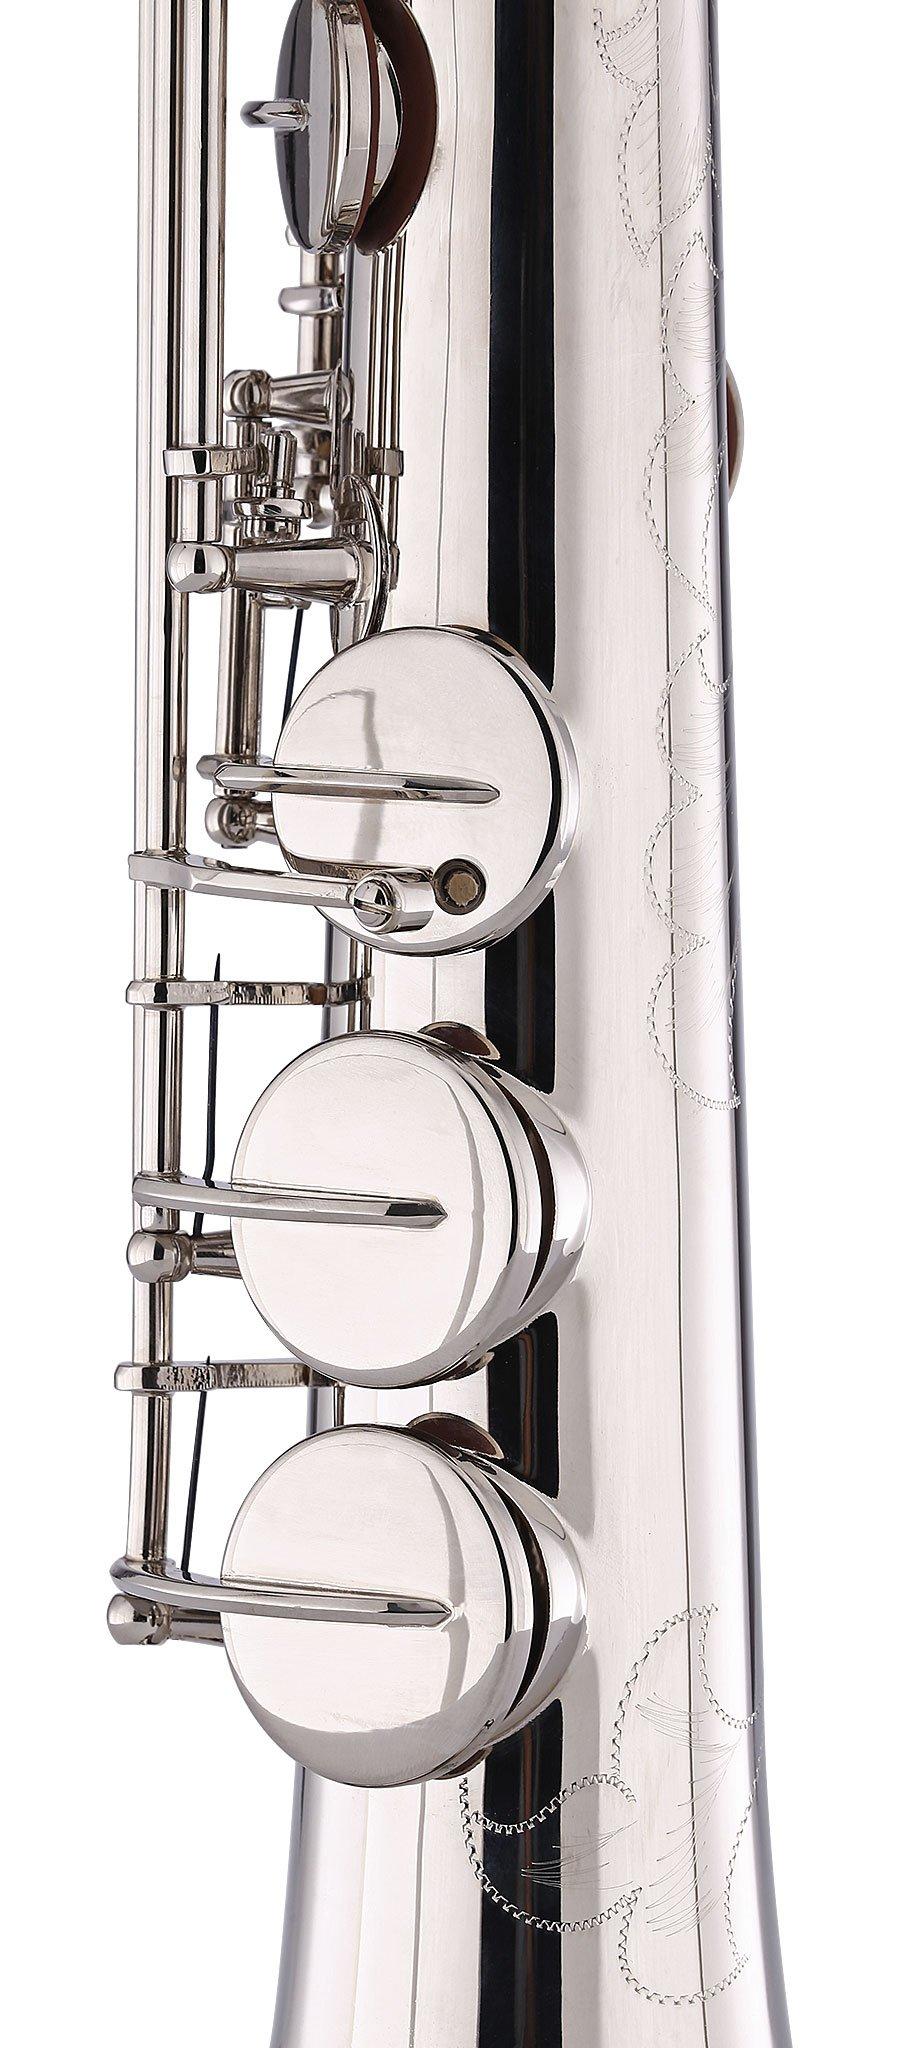 Kaizer Soprano Saxophone Straight B Flat Bb Nickel Silver SSAX-1000NK by Kaizer (Image #5)